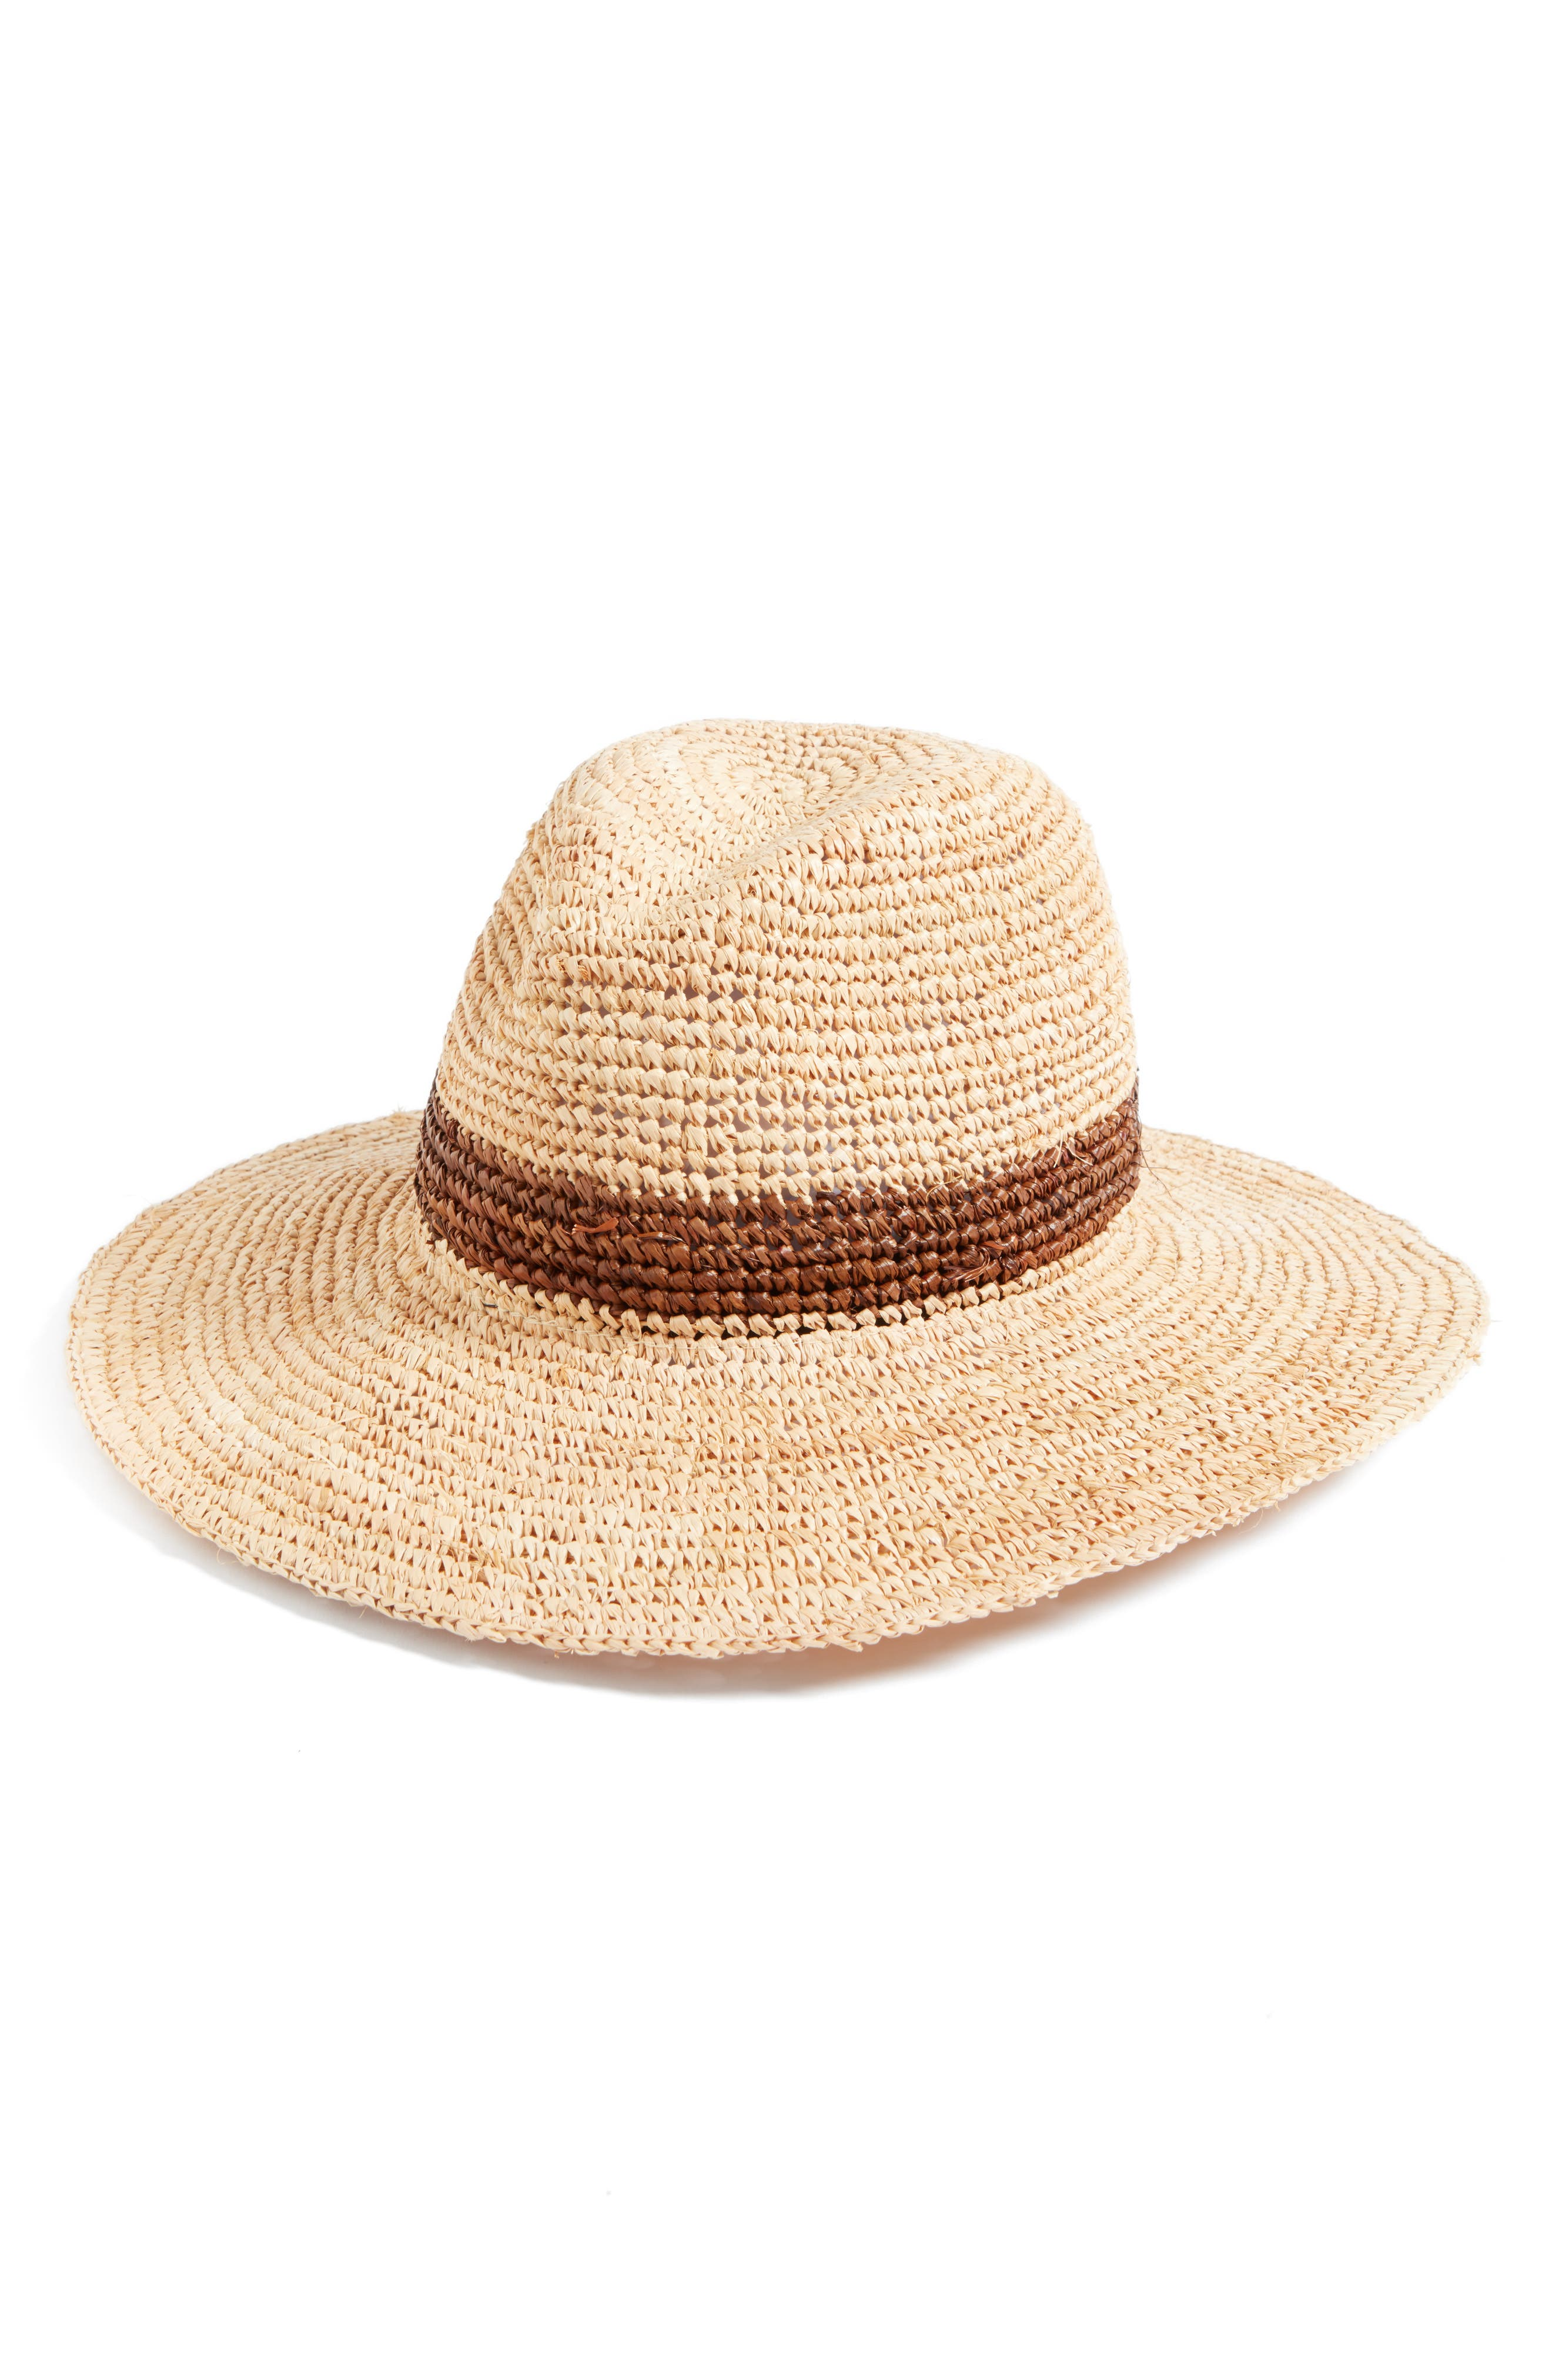 Stanton Raffia Safari Hat,                             Main thumbnail 1, color,                             200